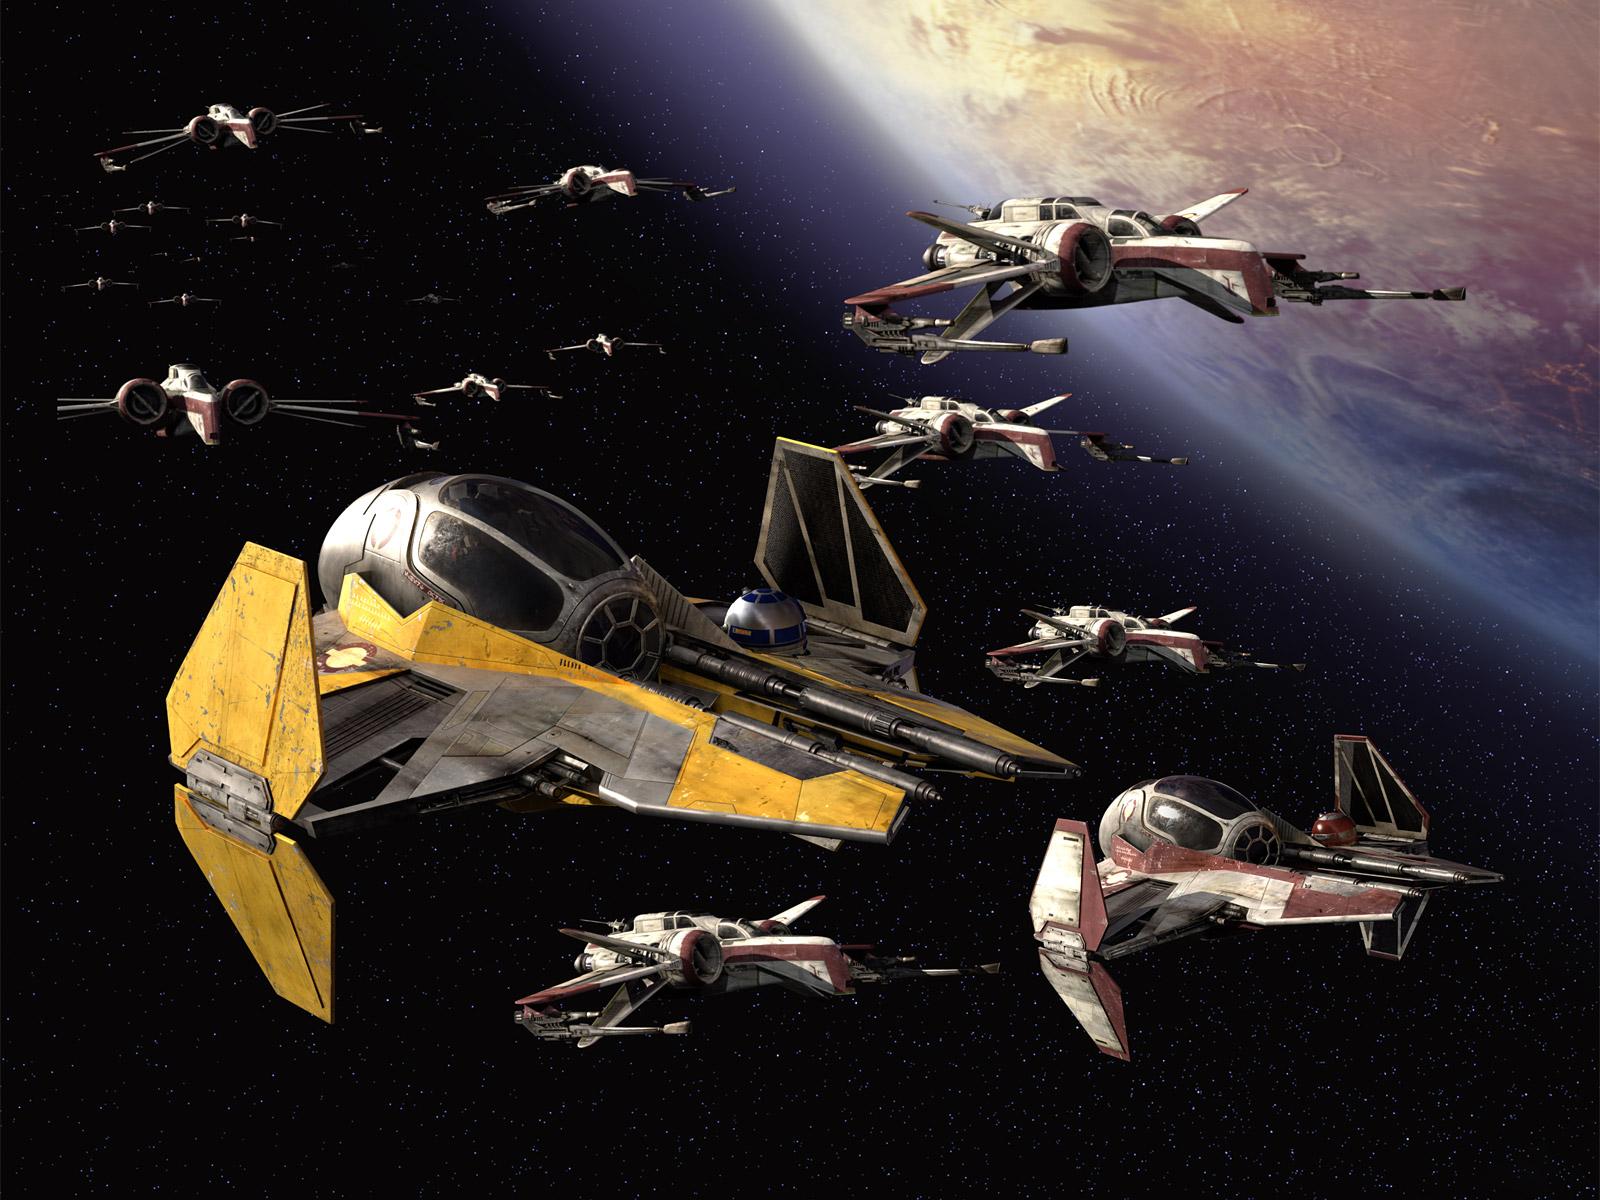 СÄСÖРєРѵР РëСÄСÖС́РźРńРёСÖРźРѵСé ARC-170 (Star Wars: The For…